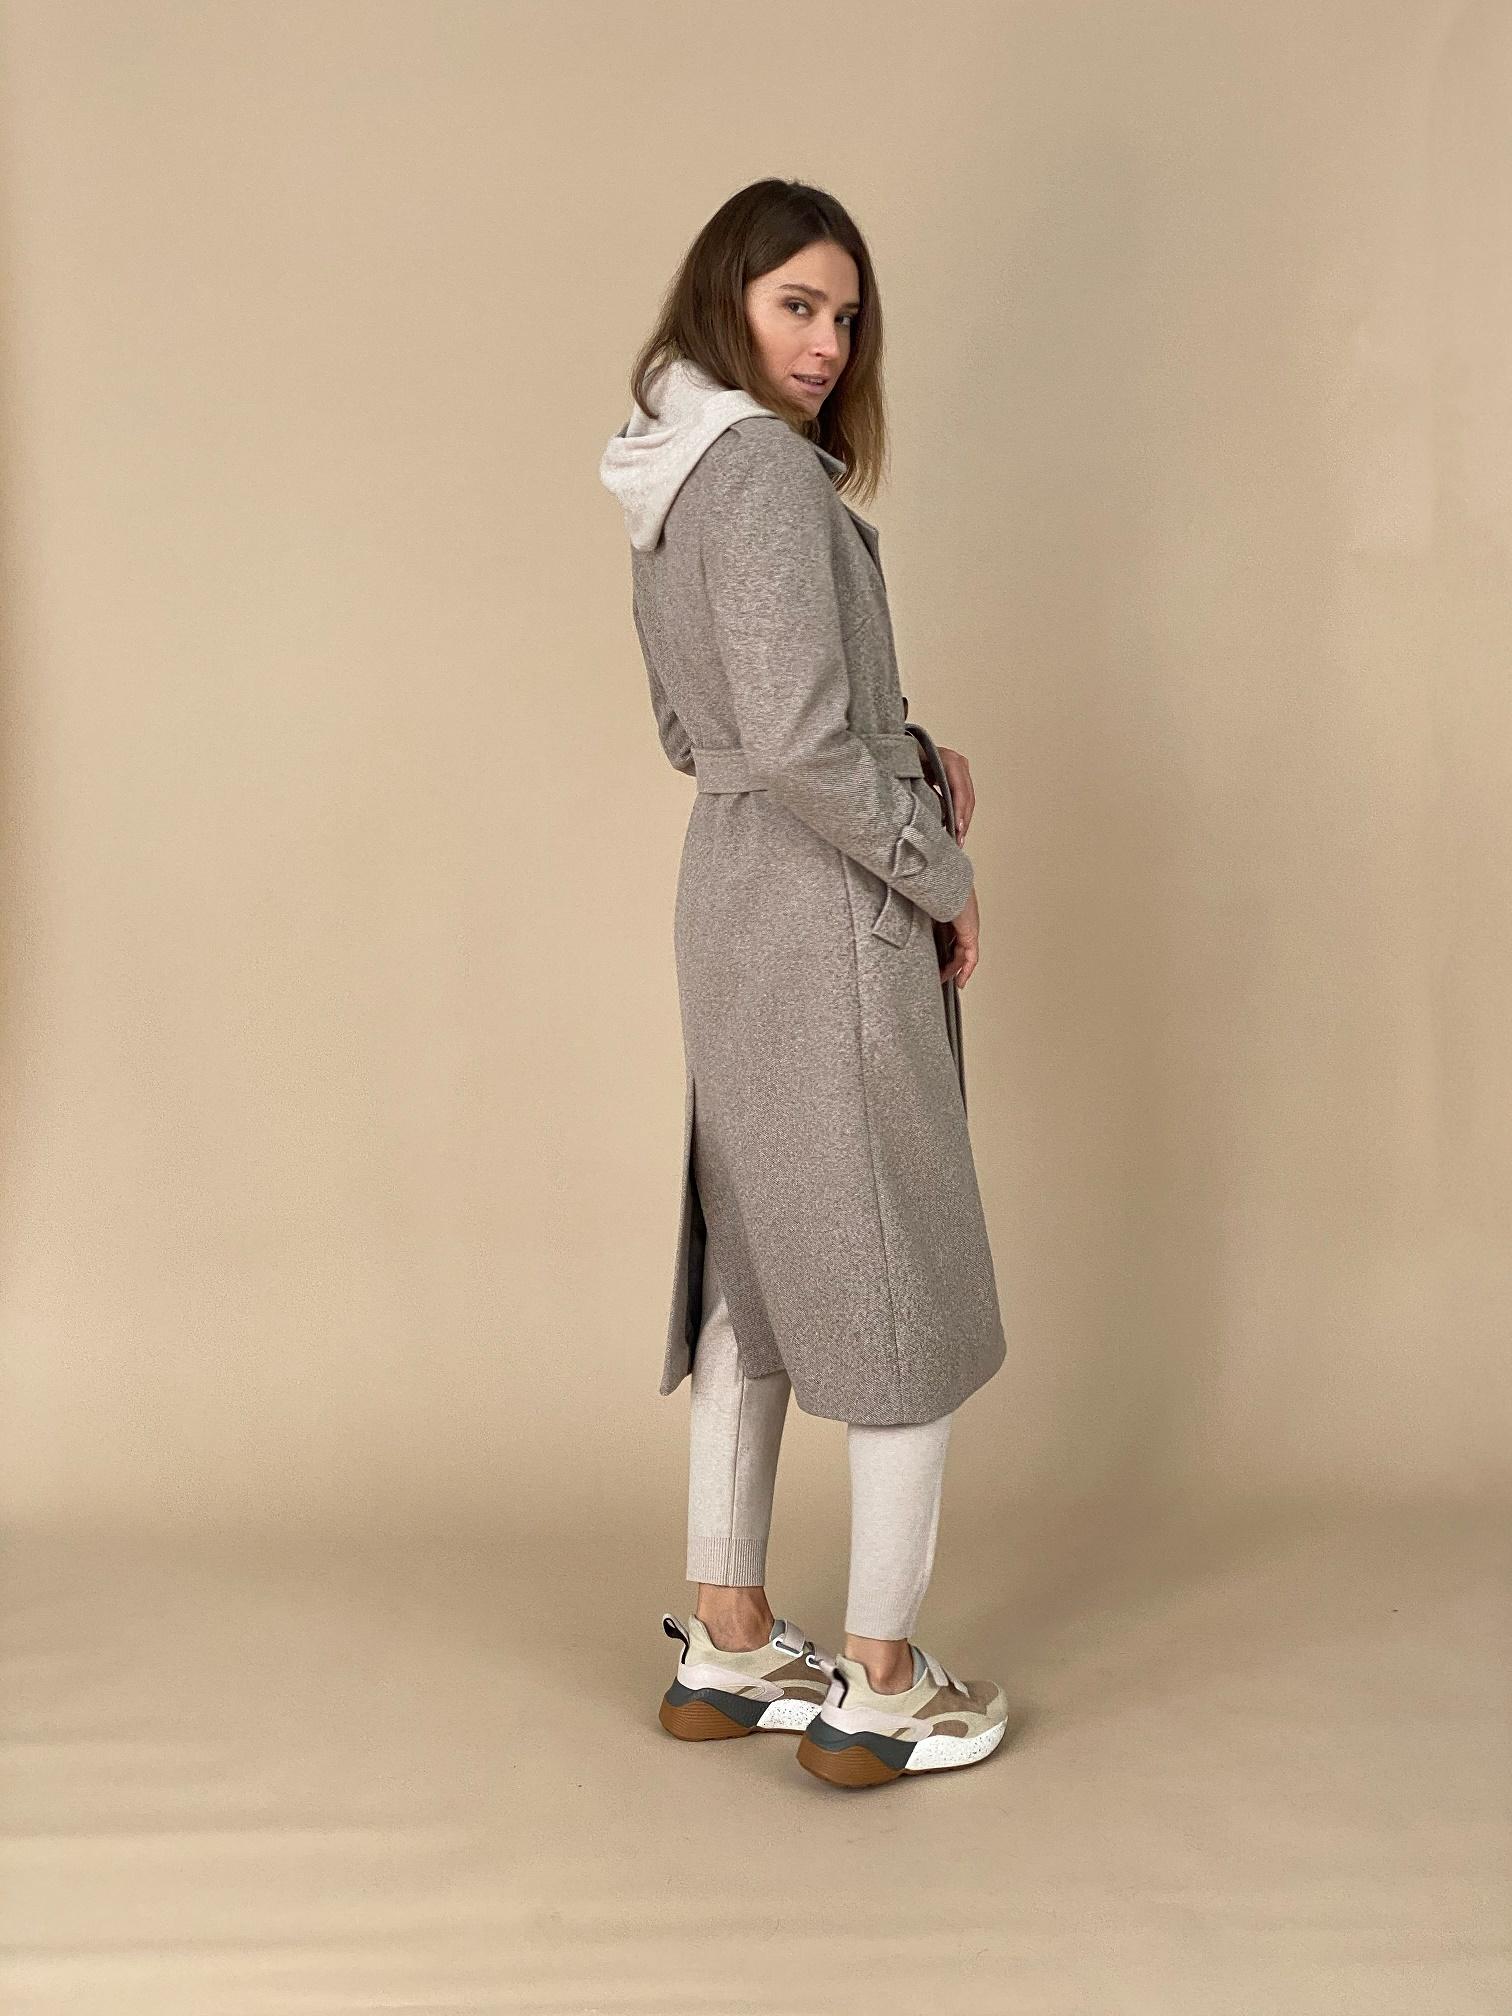 Пальто, Ballerina, Manchester (бежевый)